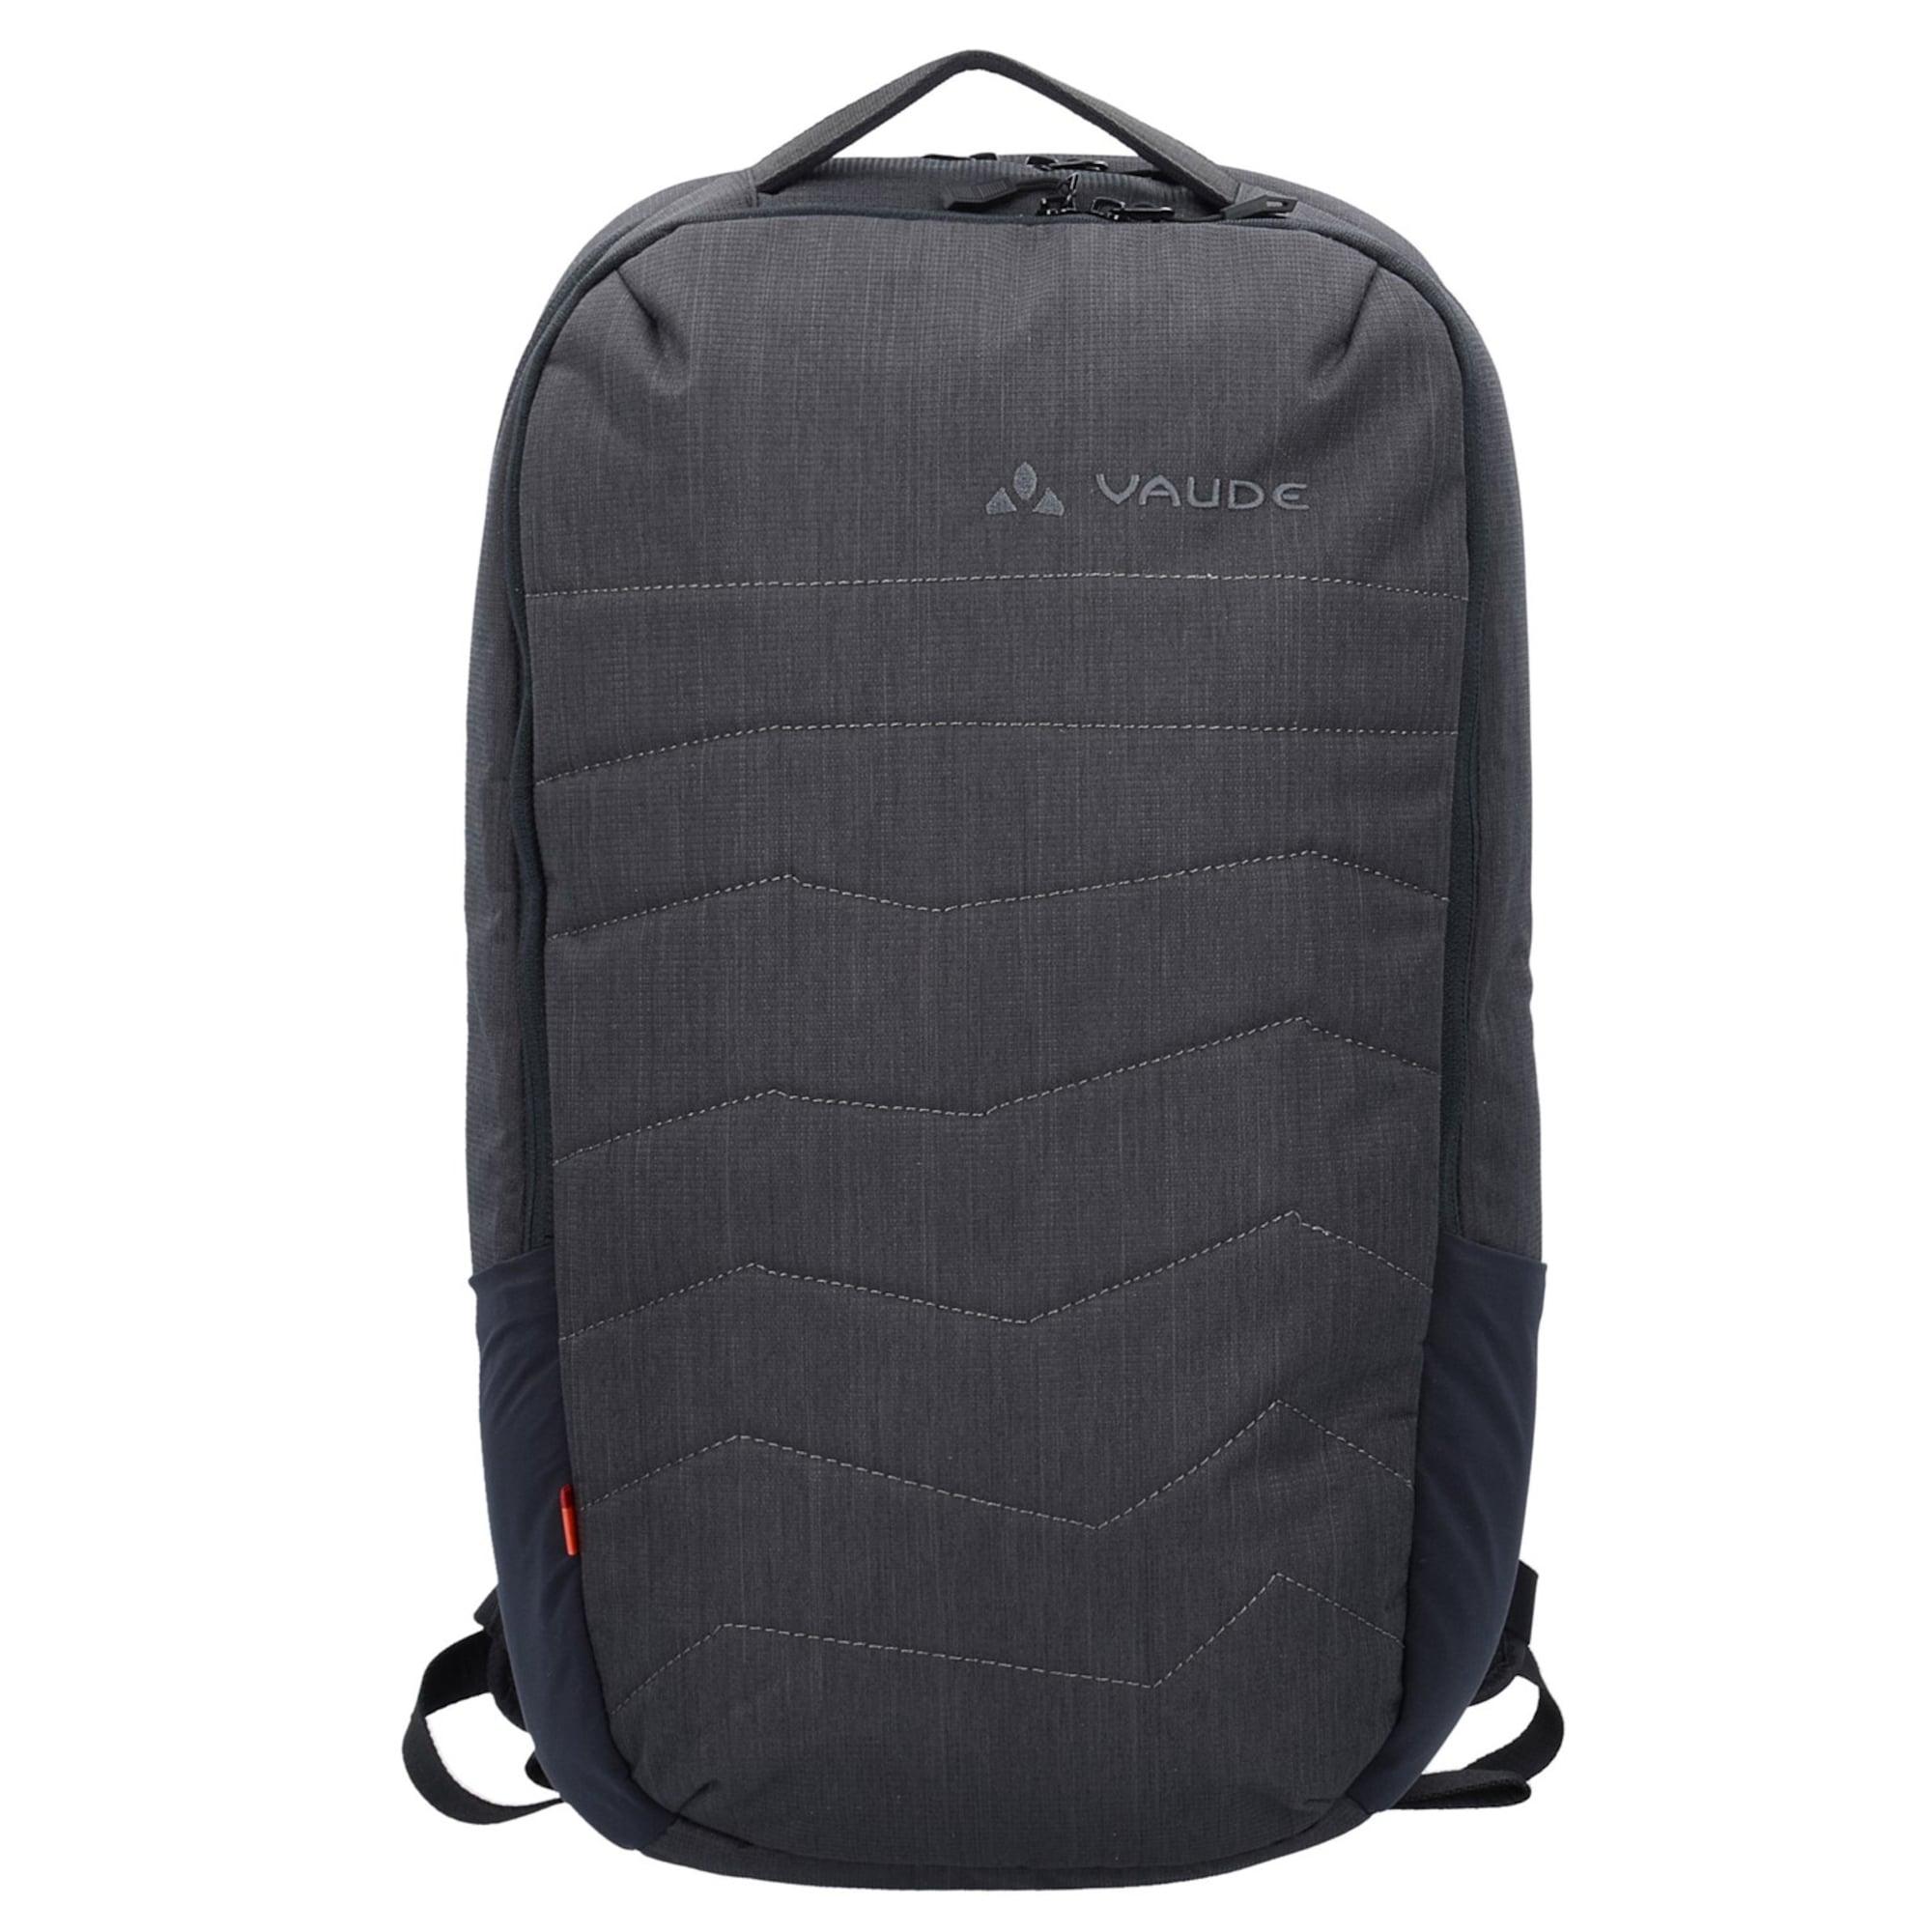 'PETimir II' Daypack   Taschen > Rucksäcke > Tagesrucksäcke   Vaude